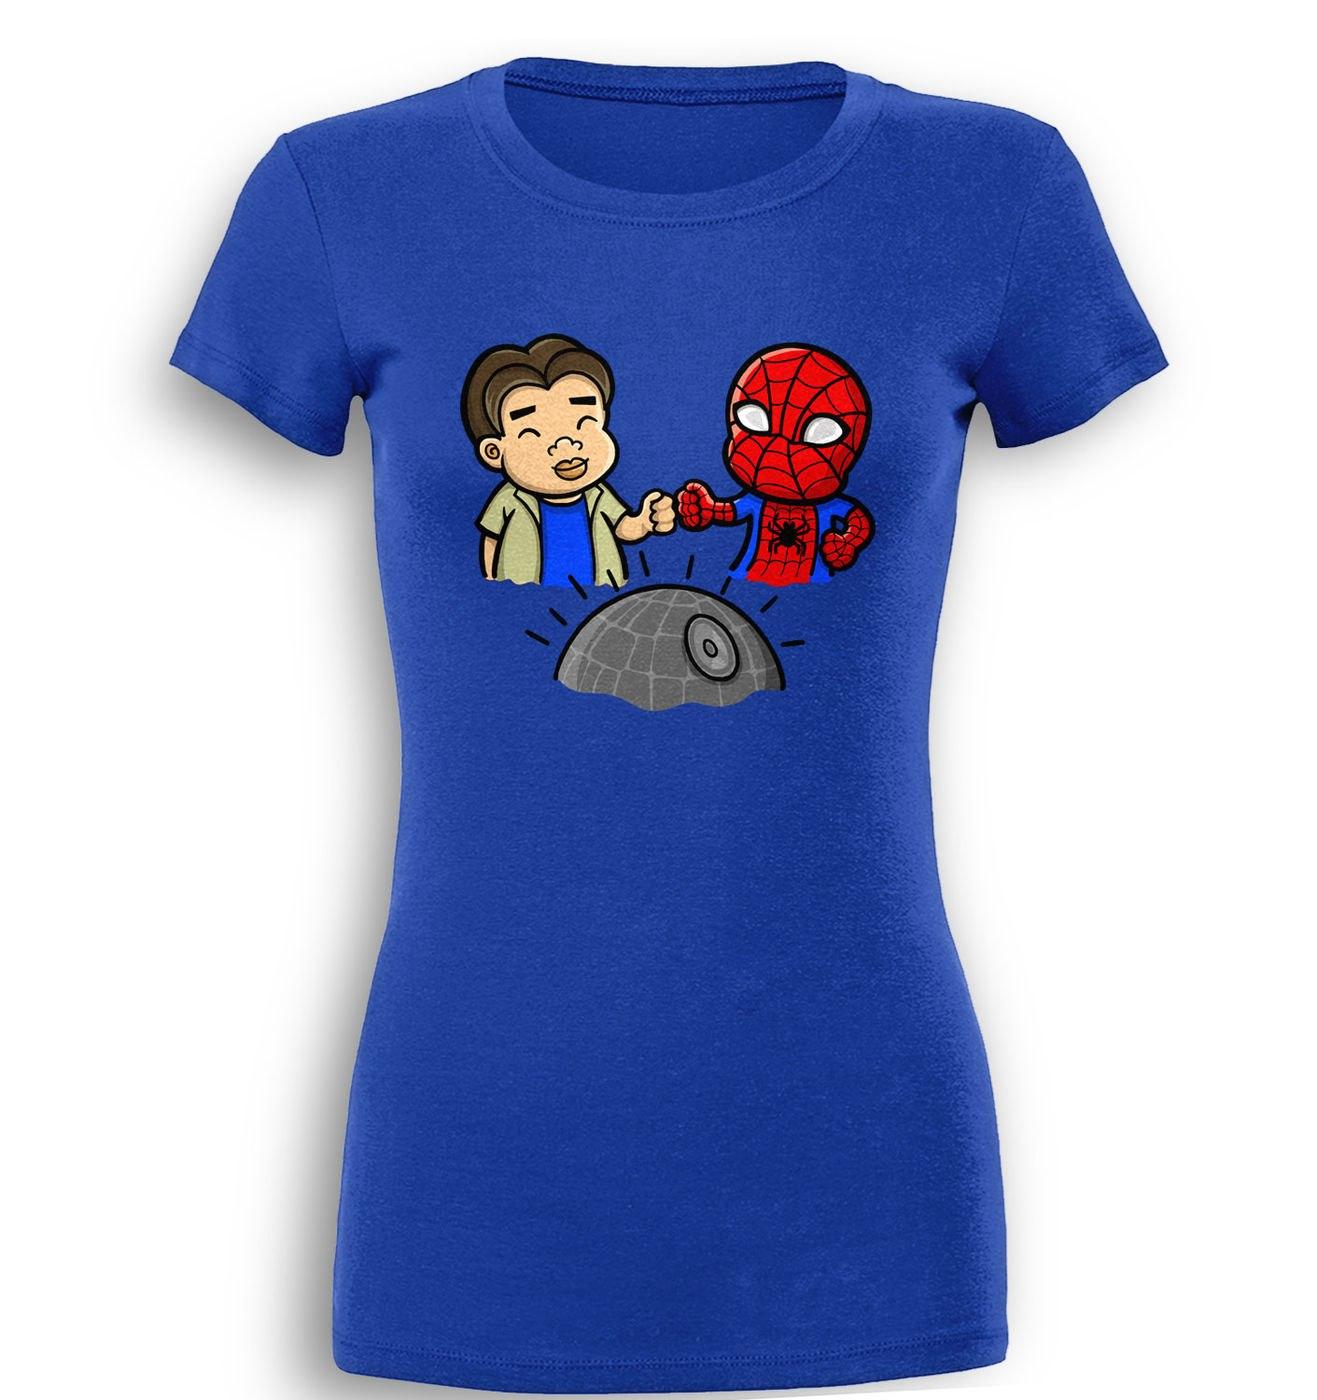 Spider-Man Death Star premium womens t-shirt by Something Geeky